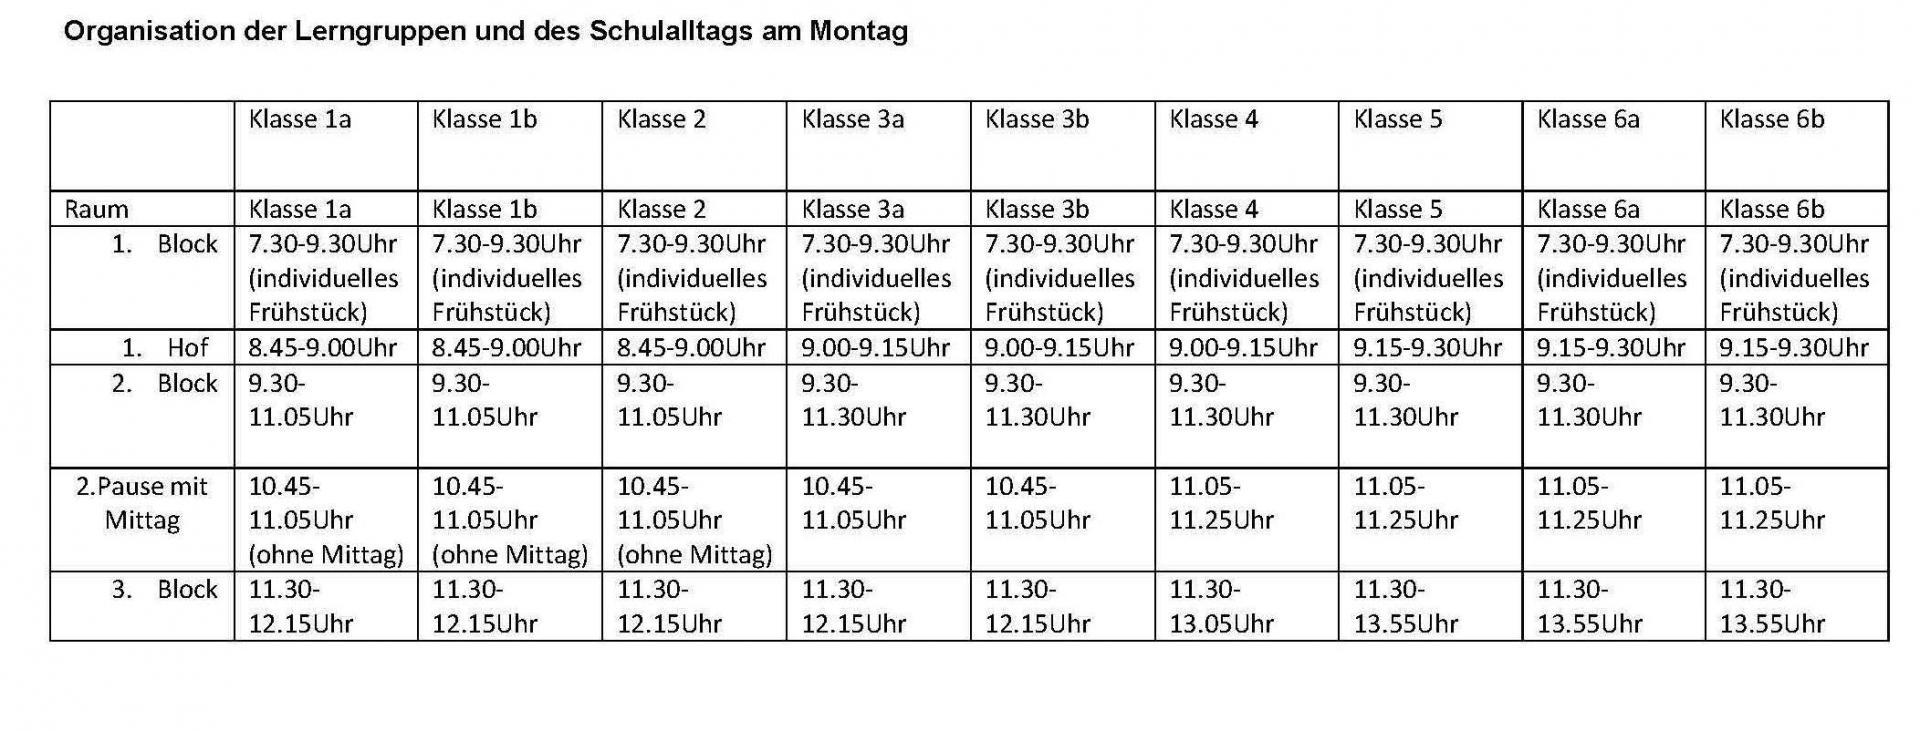 Organisation Schulalltag, montags